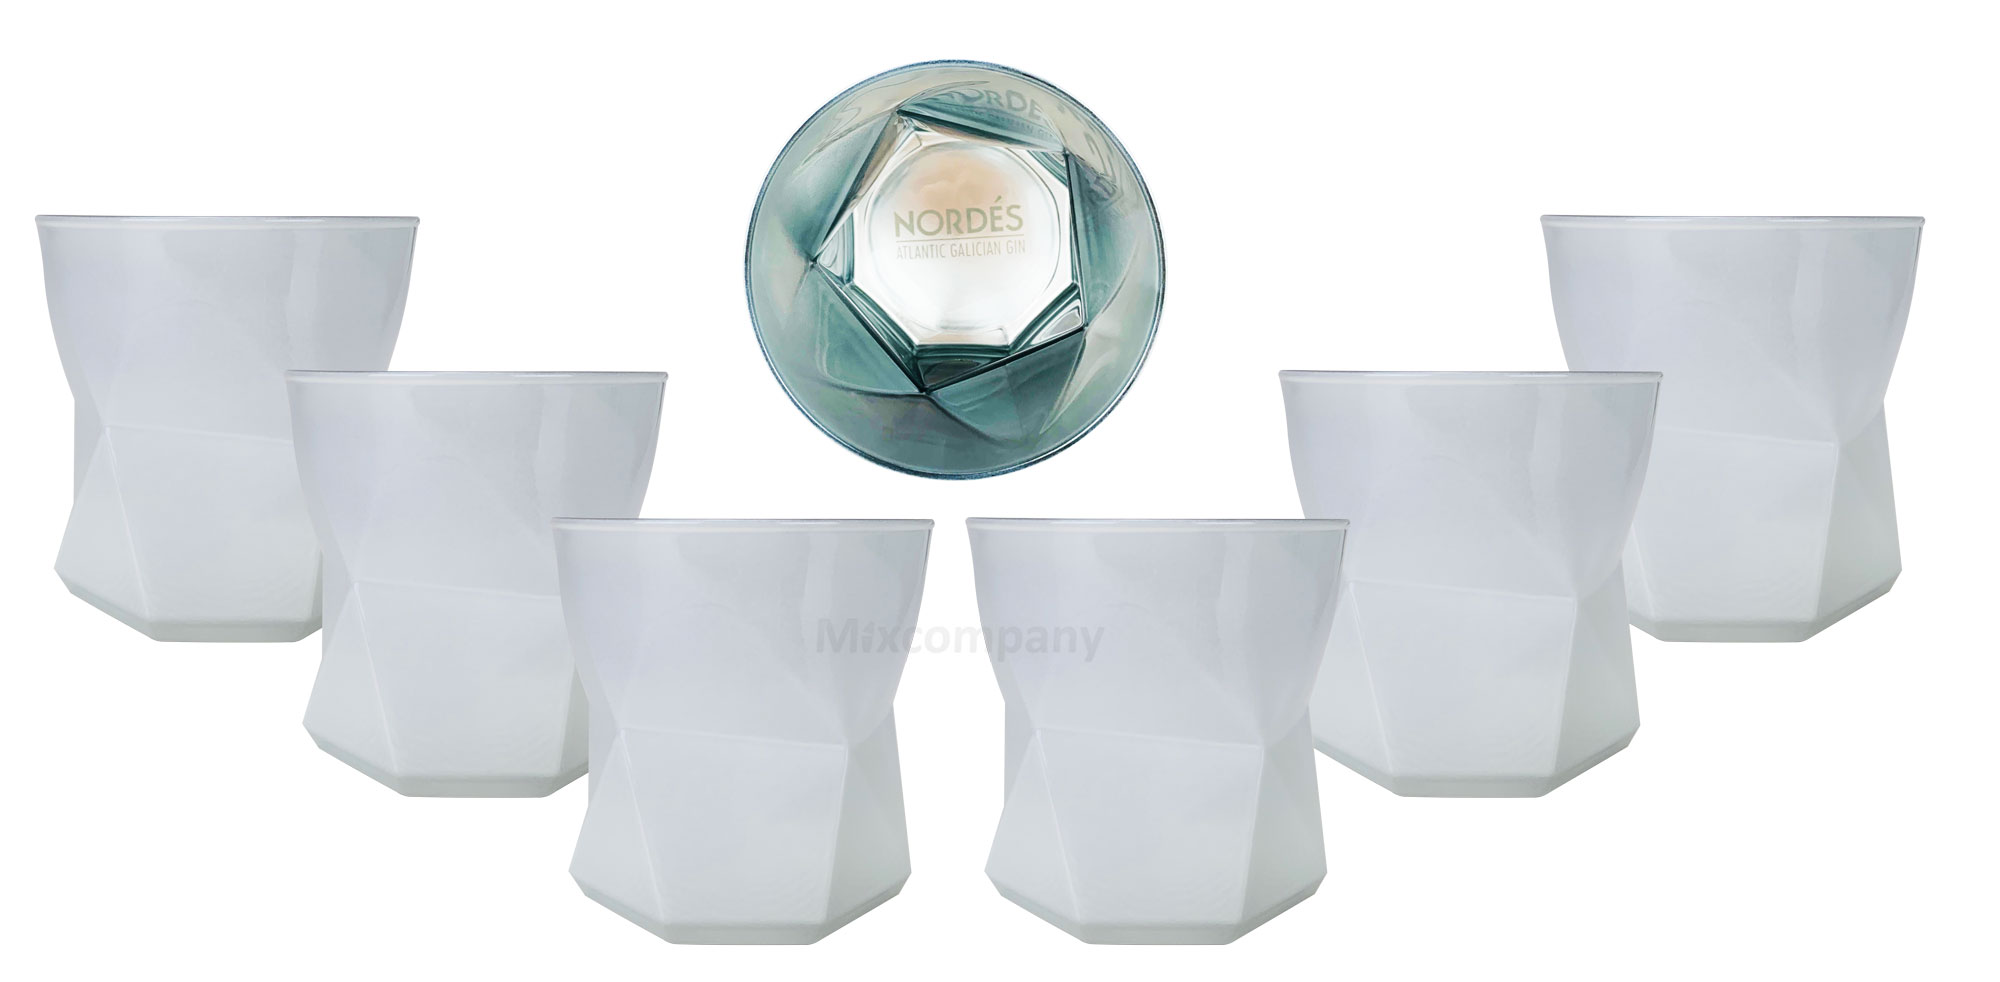 Nordes Atlantic Galician Gin Glas Tumbler Set - 6X Gläser